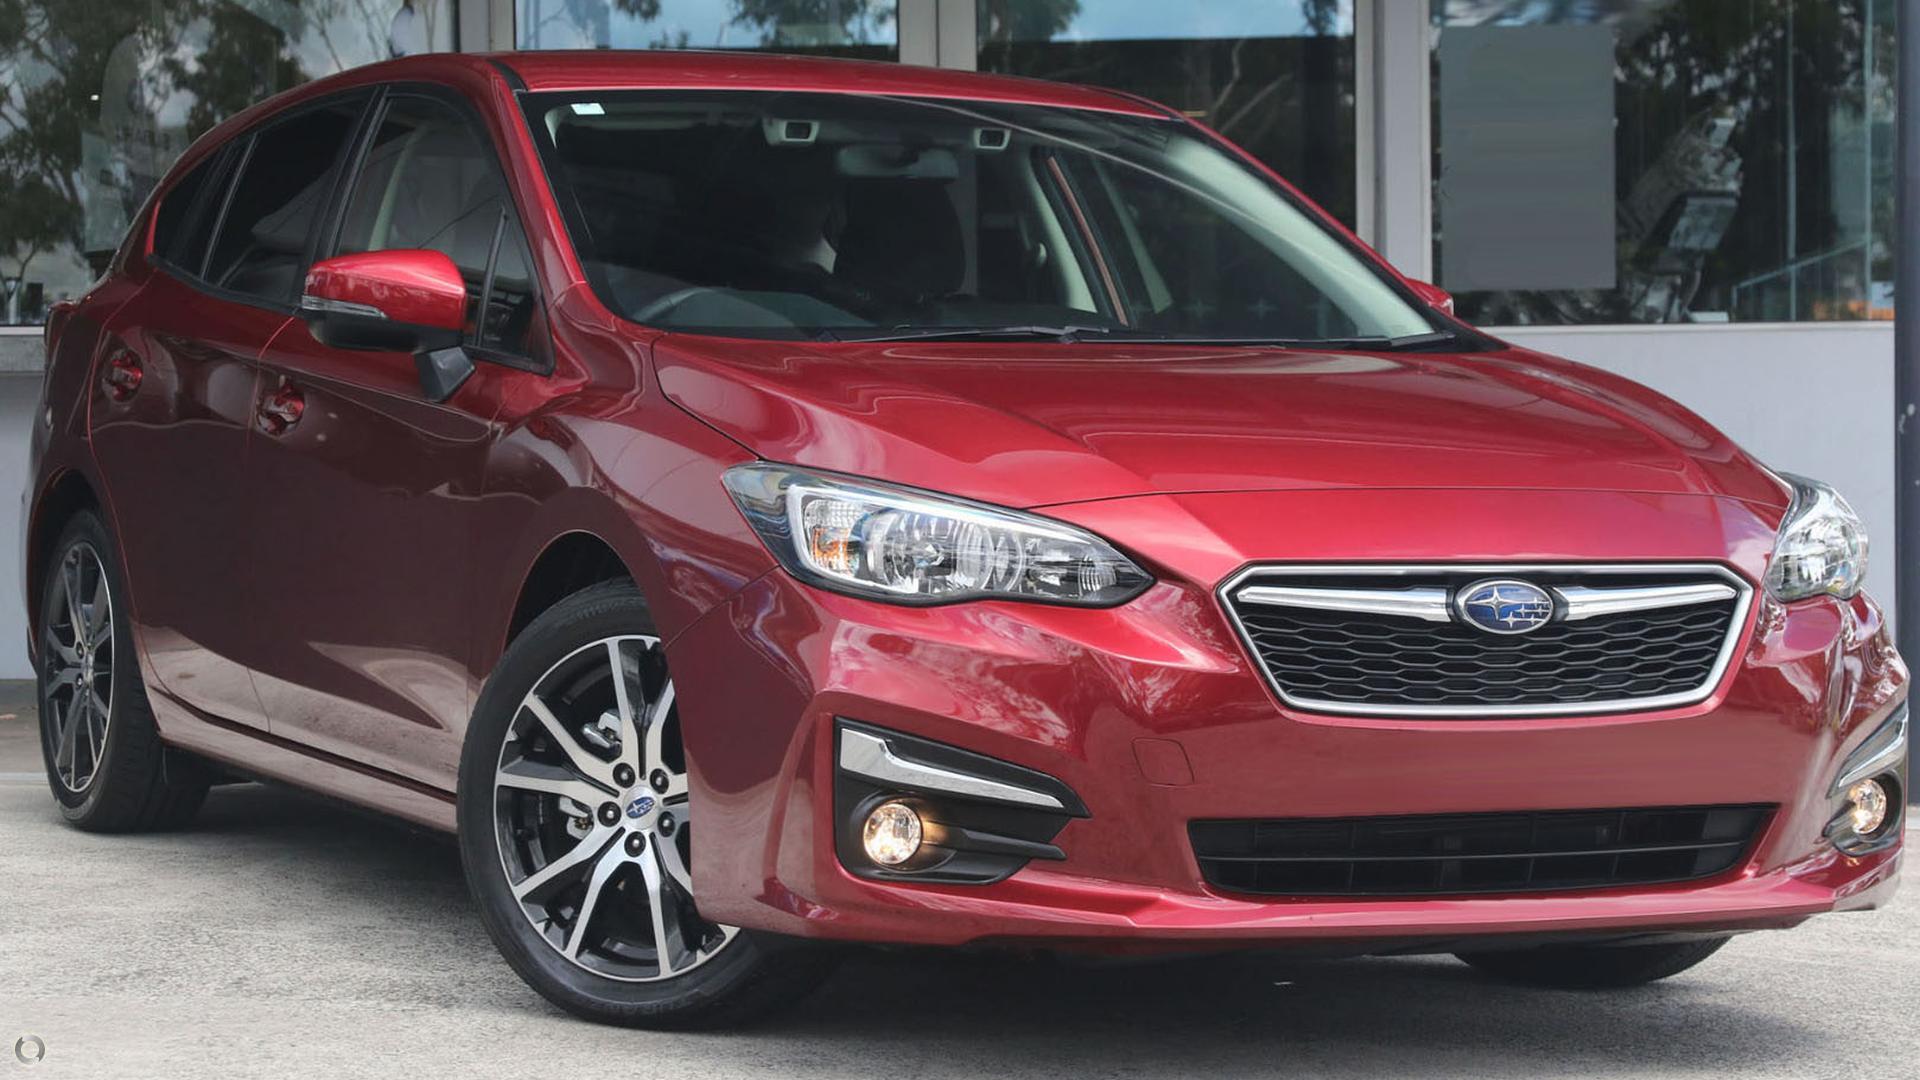 2018 Subaru Impreza 2.0i-l